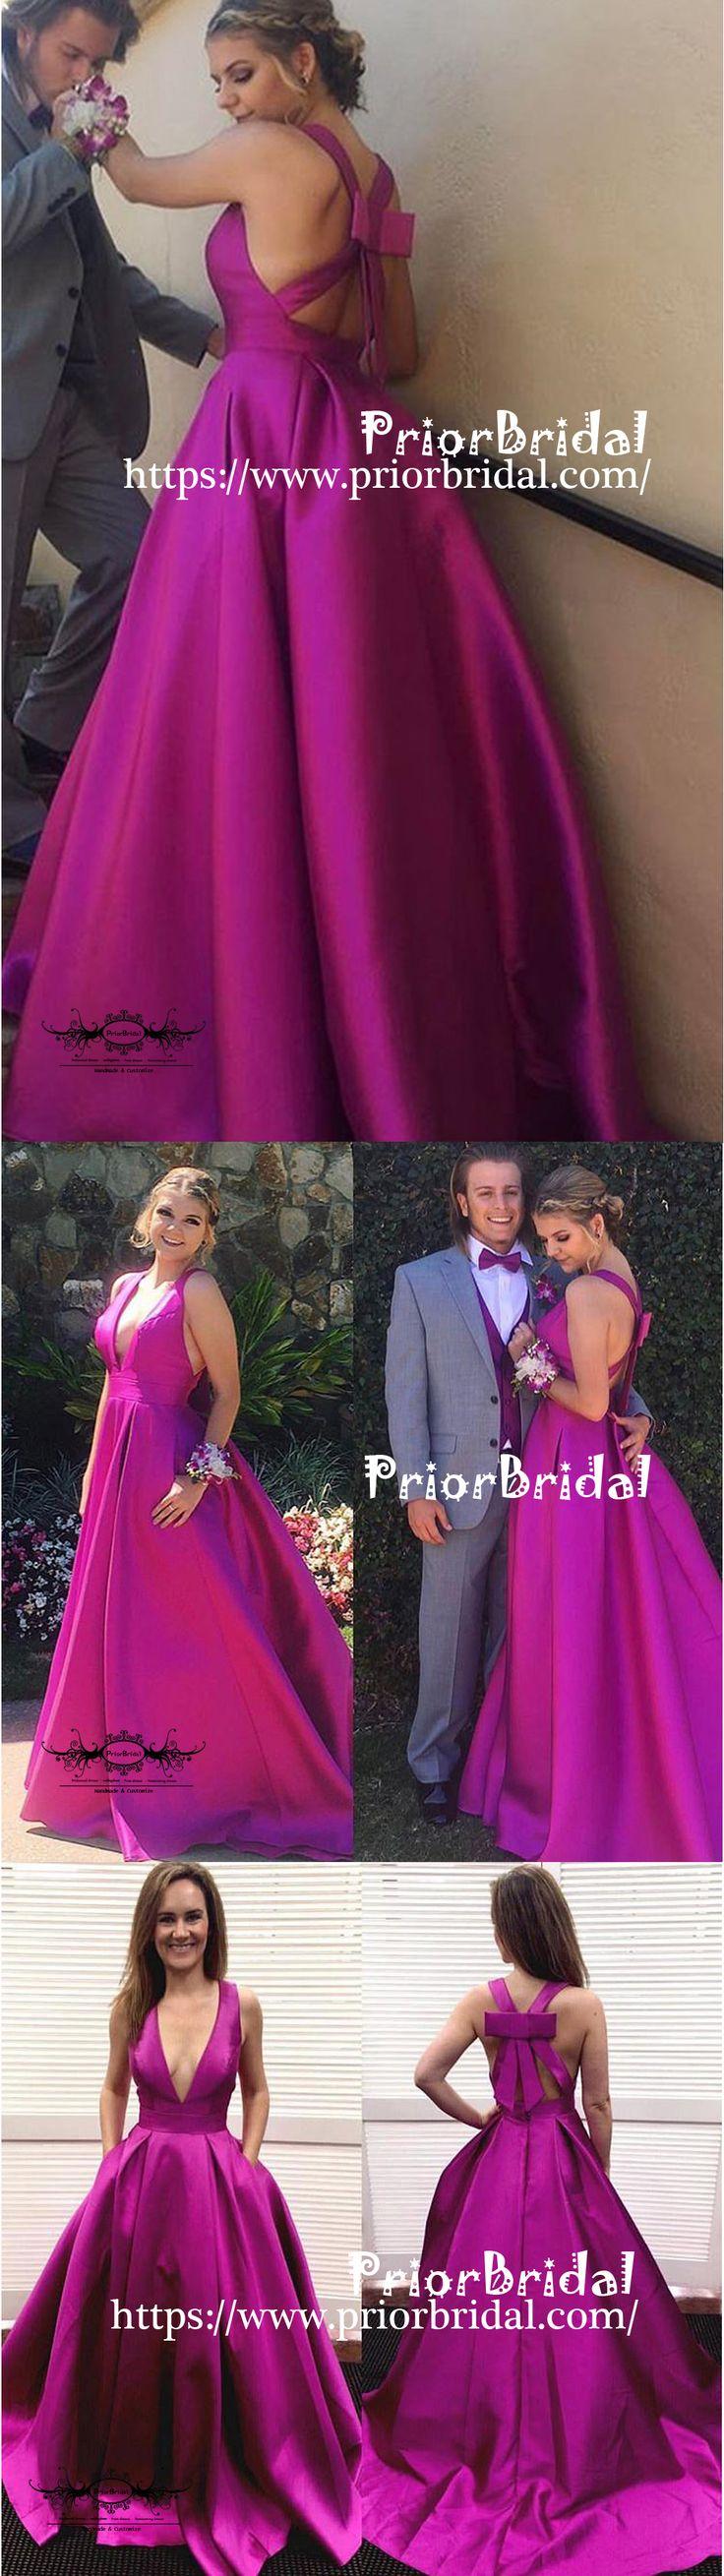 Unique Design Bowknot Back Deep V-neck Simple Purple Ball Gown Prom Dresses,PB1038